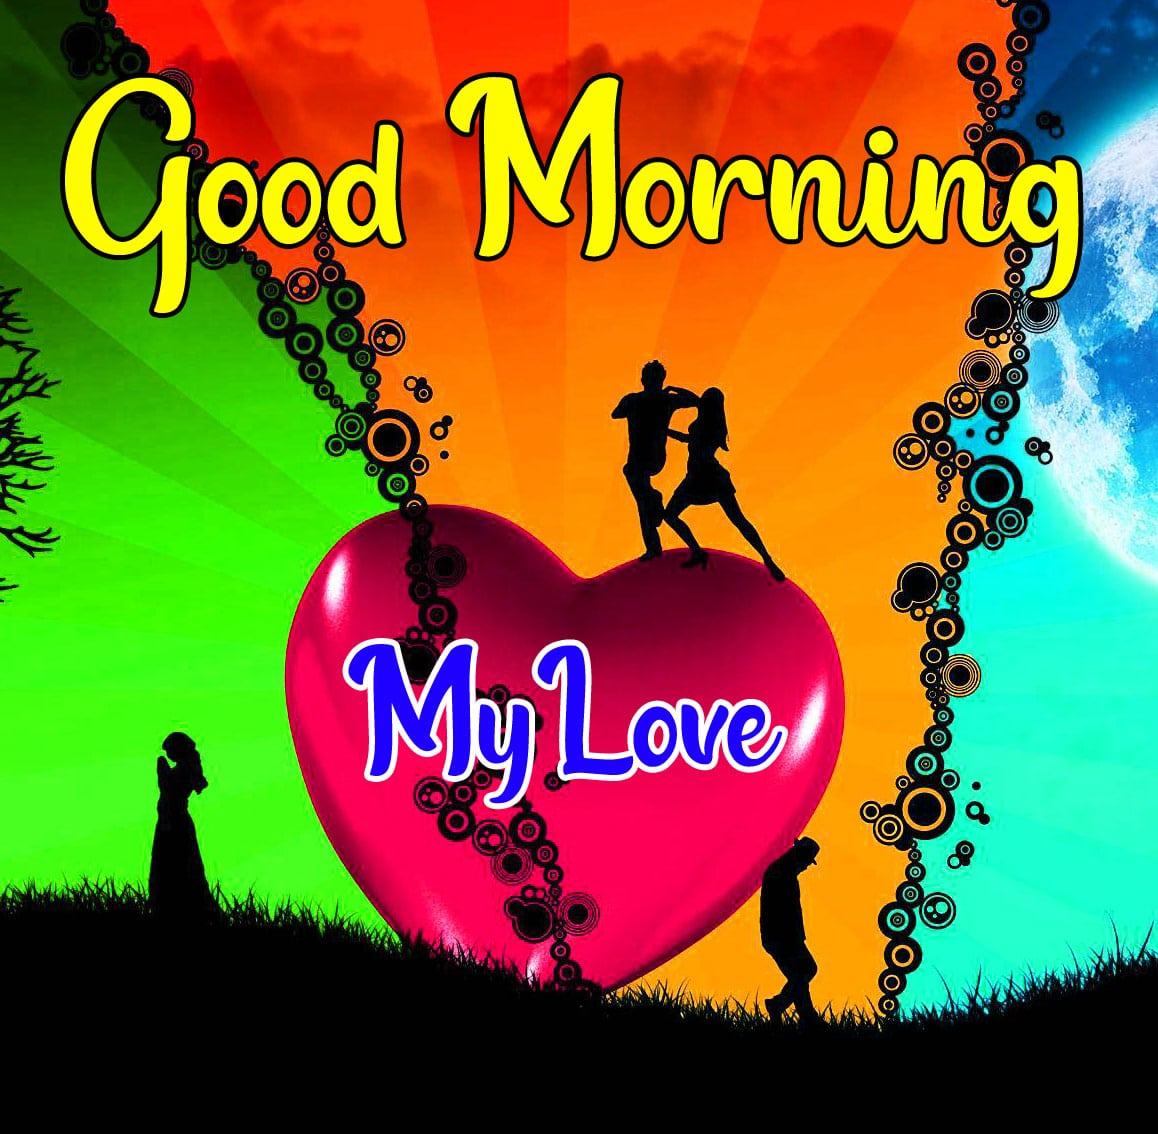 Good Morning Pics Wallpaper 6